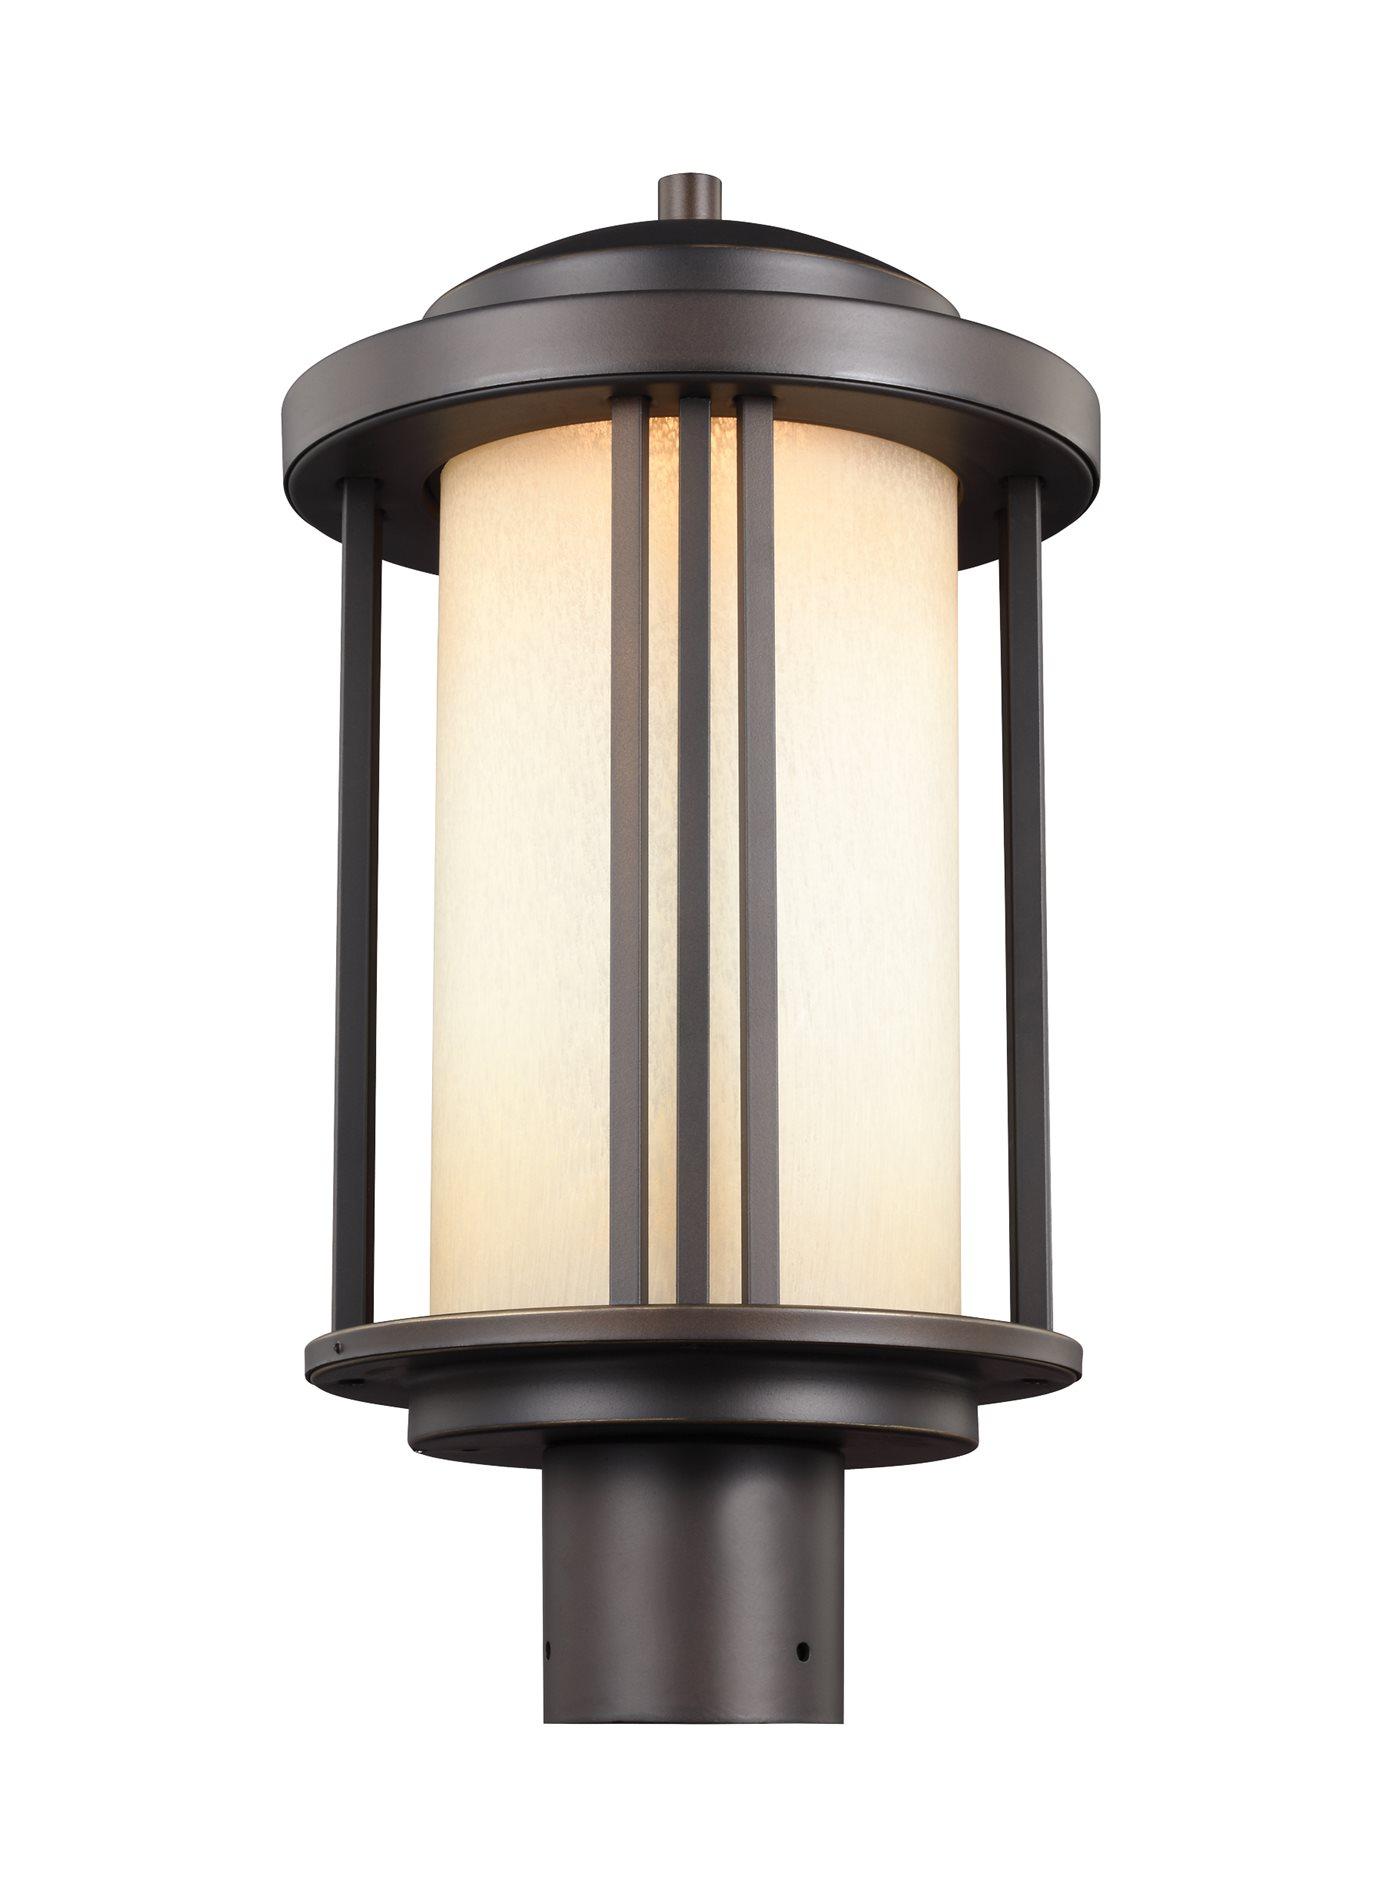 Sea Gull Lighting 8247991S 71 Crowell Modern Contemporary Lamp SG 8247991S 71